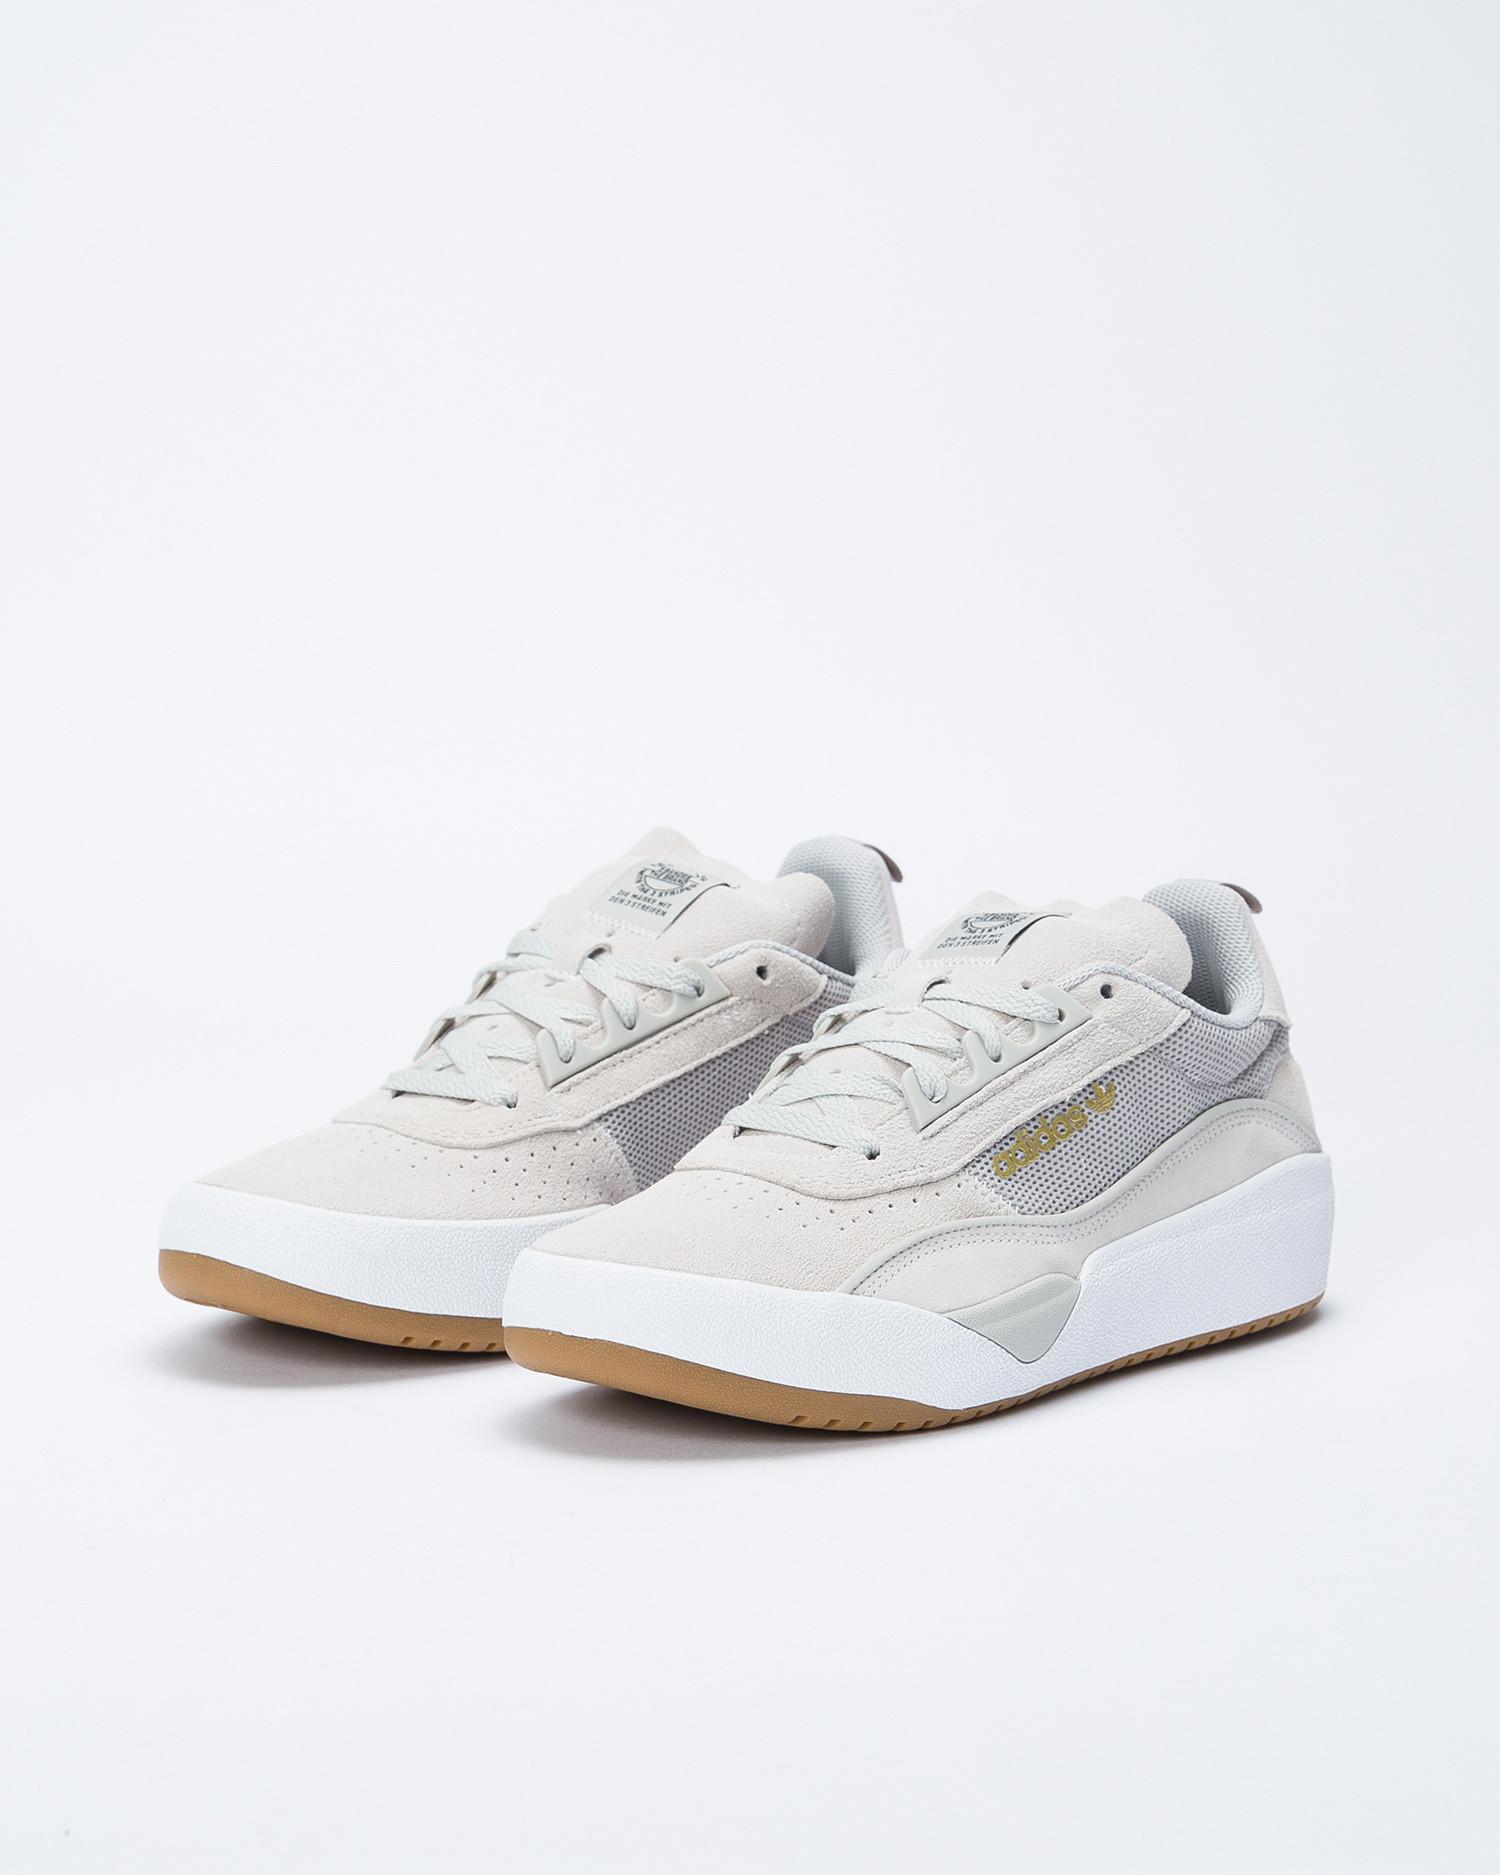 Adidas Liberty Cup Footwear White/Gum4/Gold Metalic